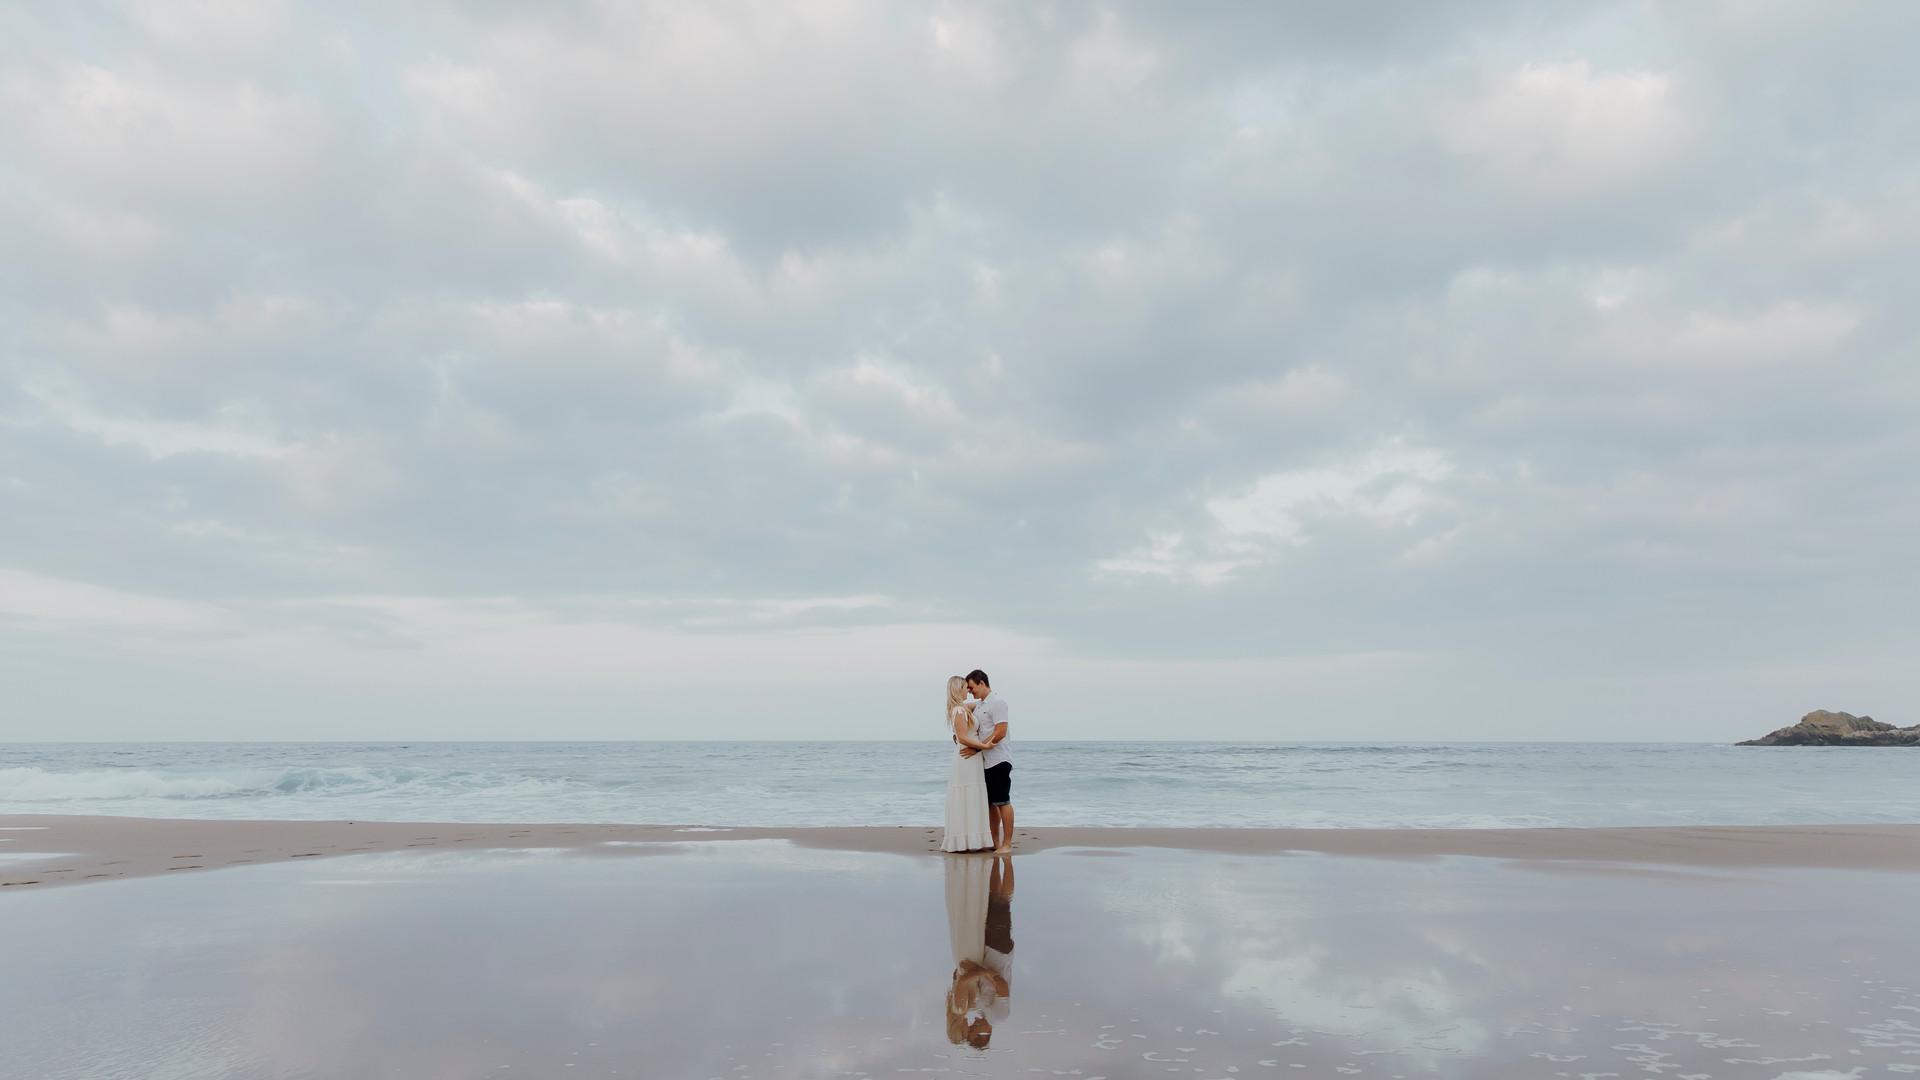 Engagement Photographer | Northland | Whangarei